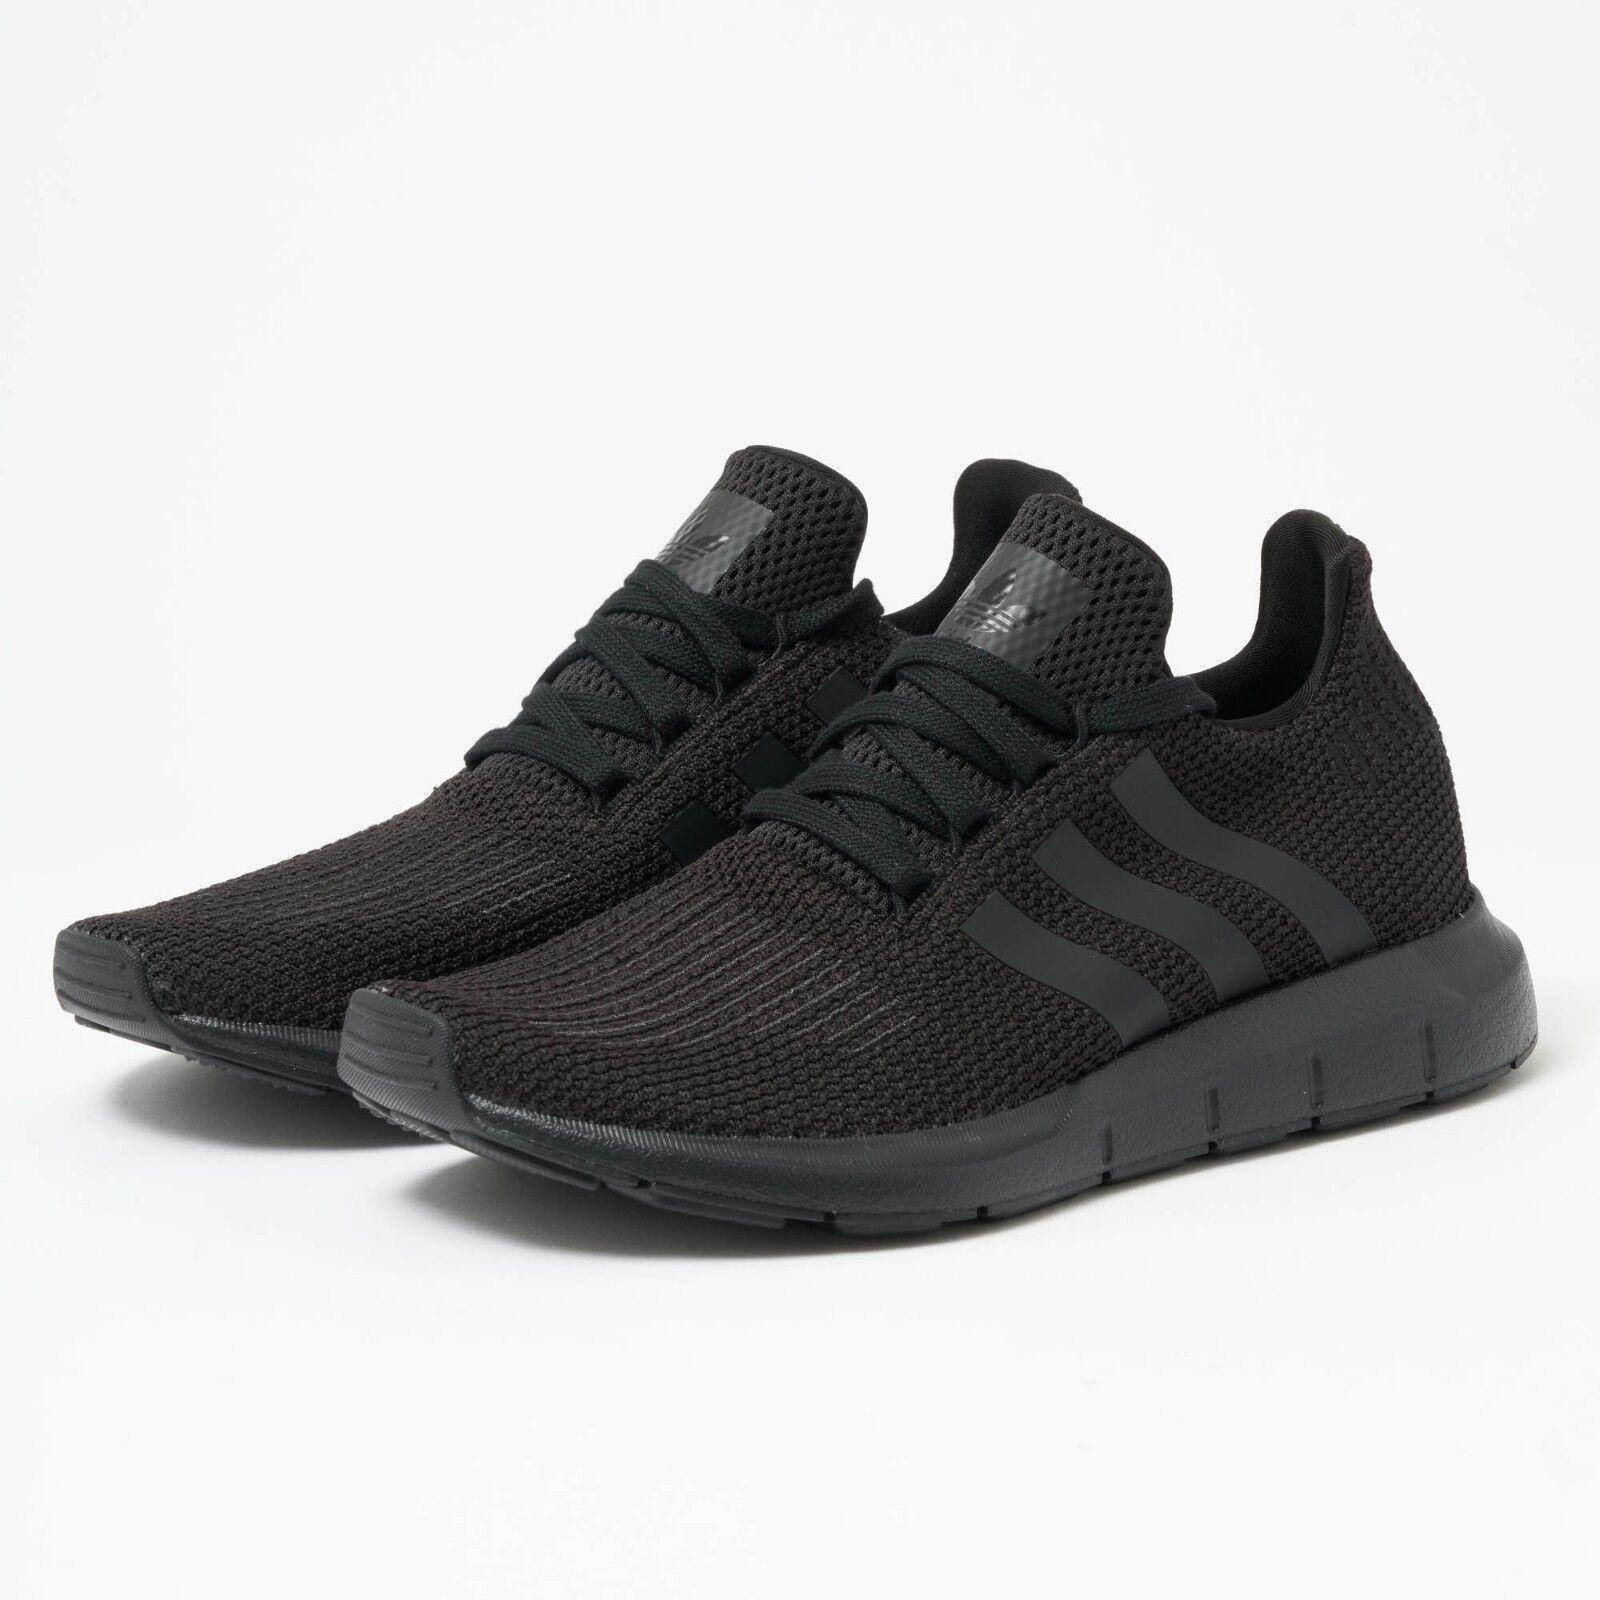 Adidas AQ0863 Men ORIGINALS Swift Run Running shoes black sneakers